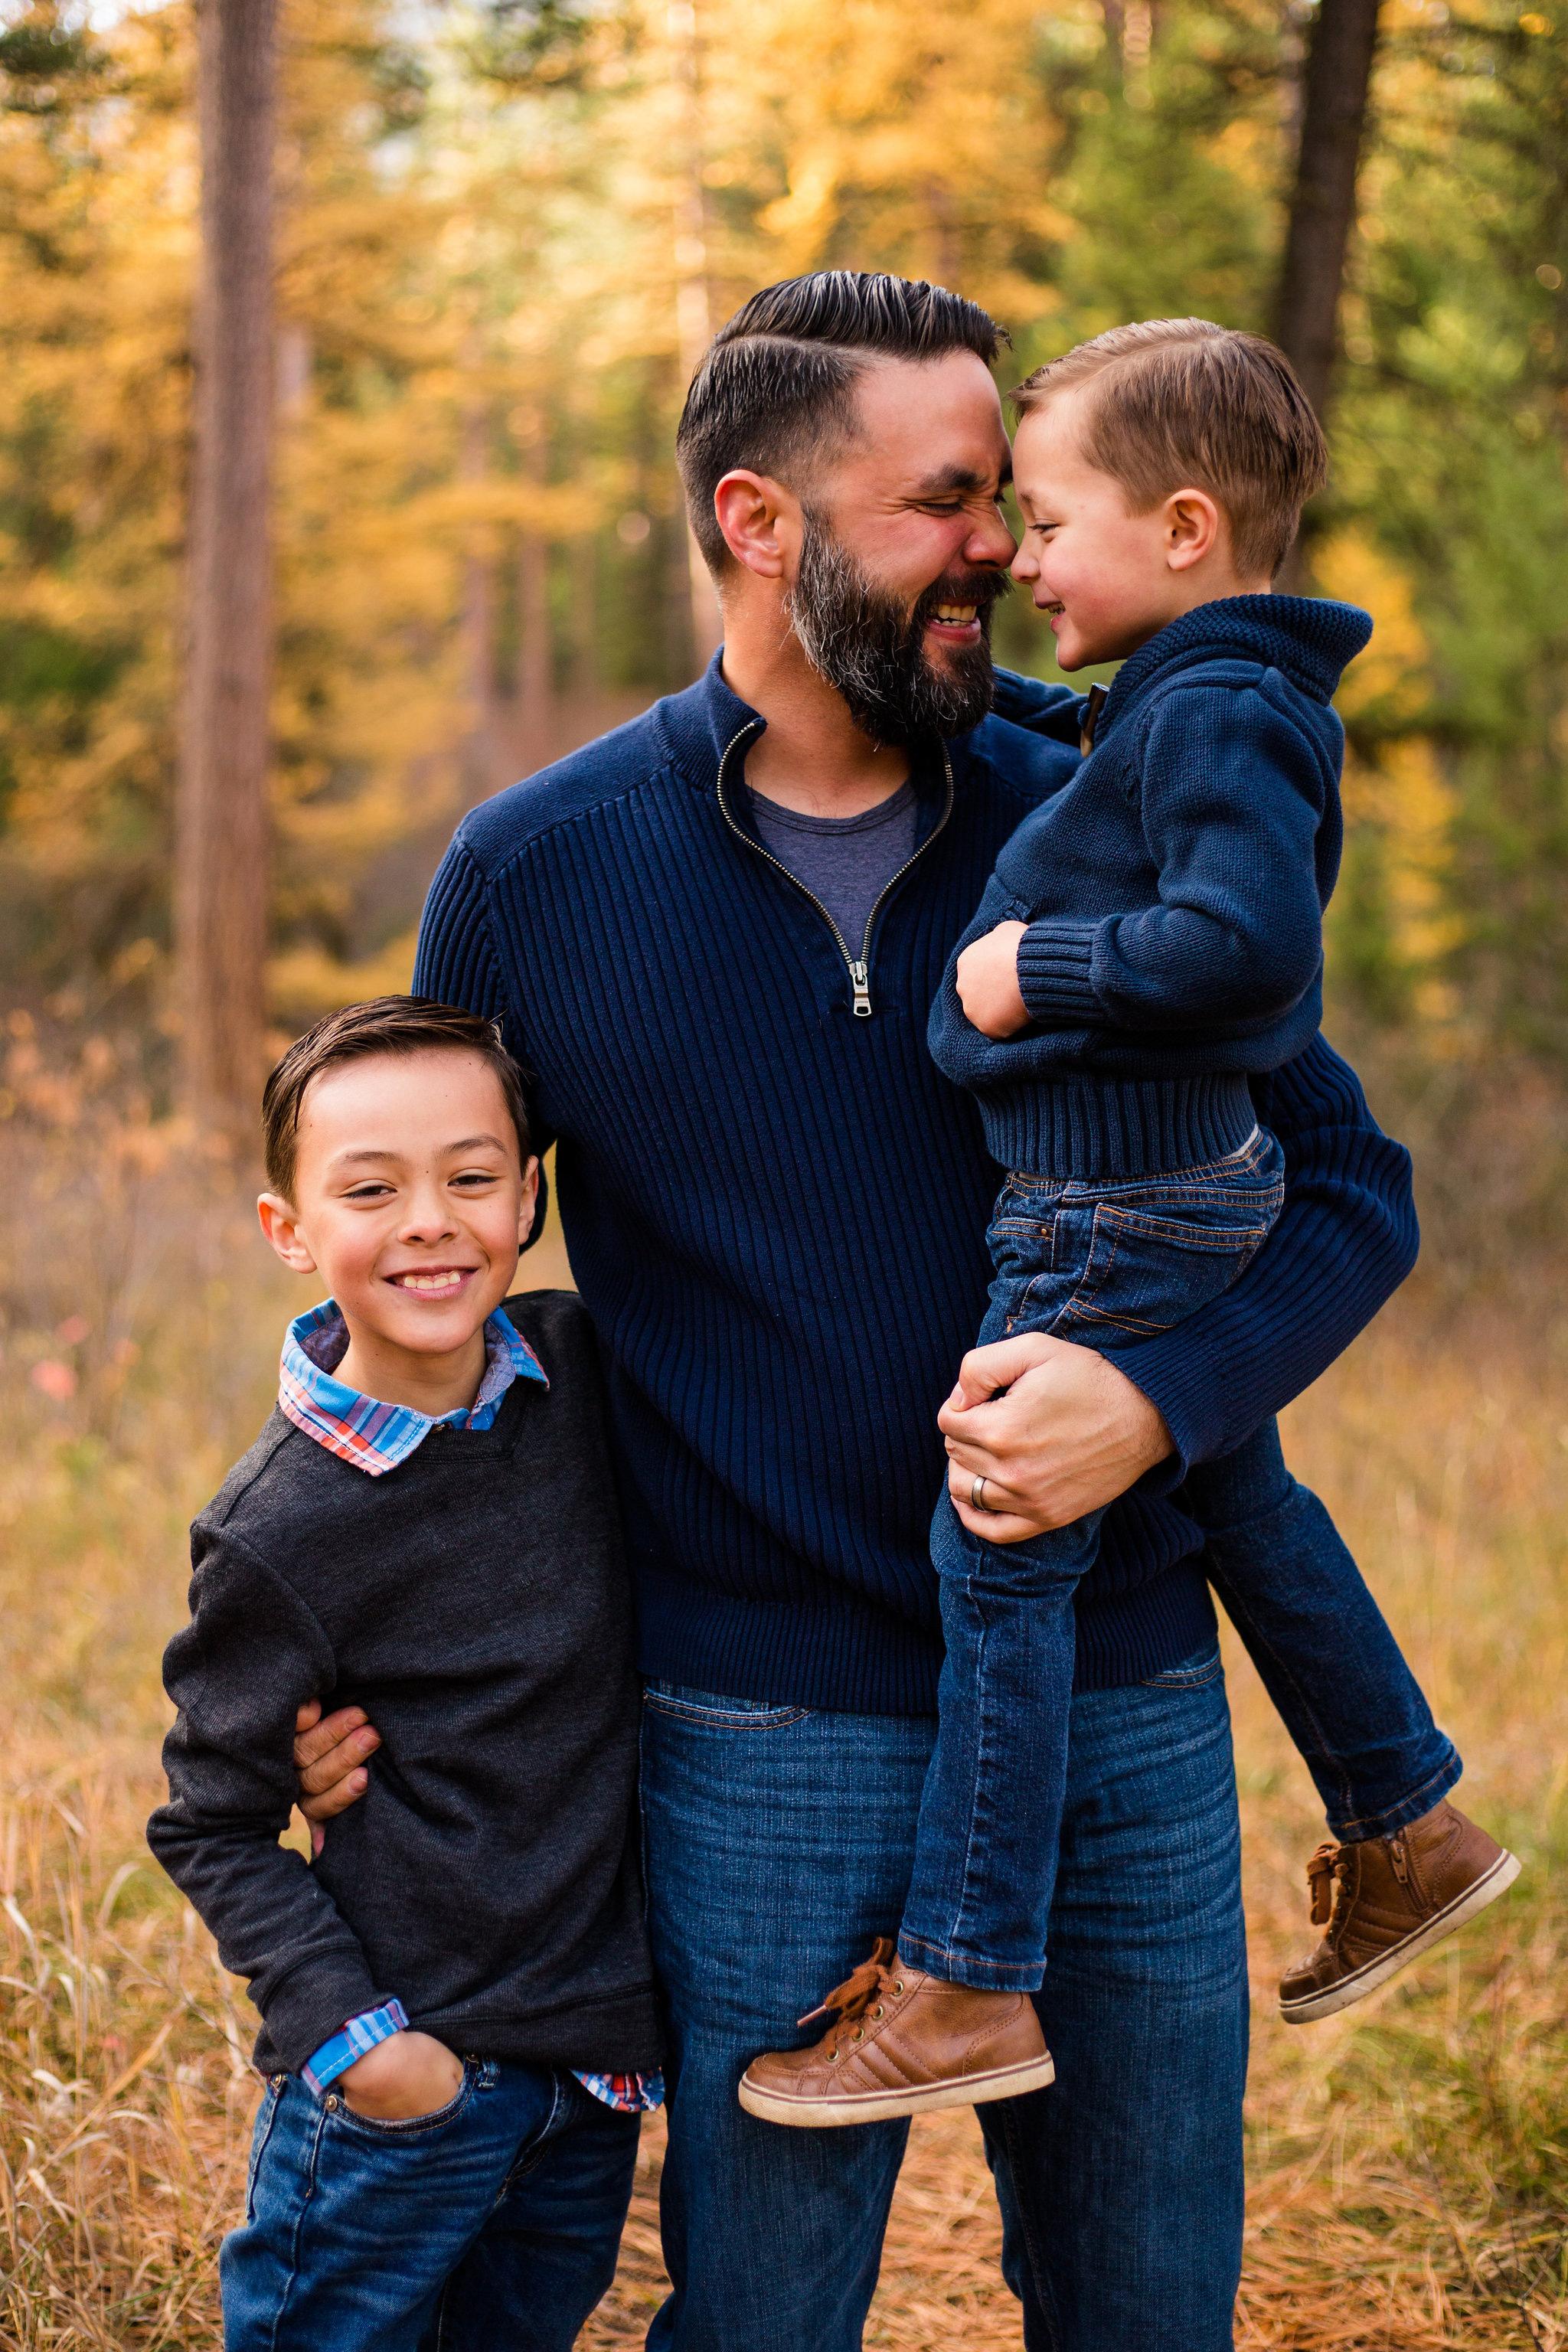 family-photographer-missoula-montana-49.jpg